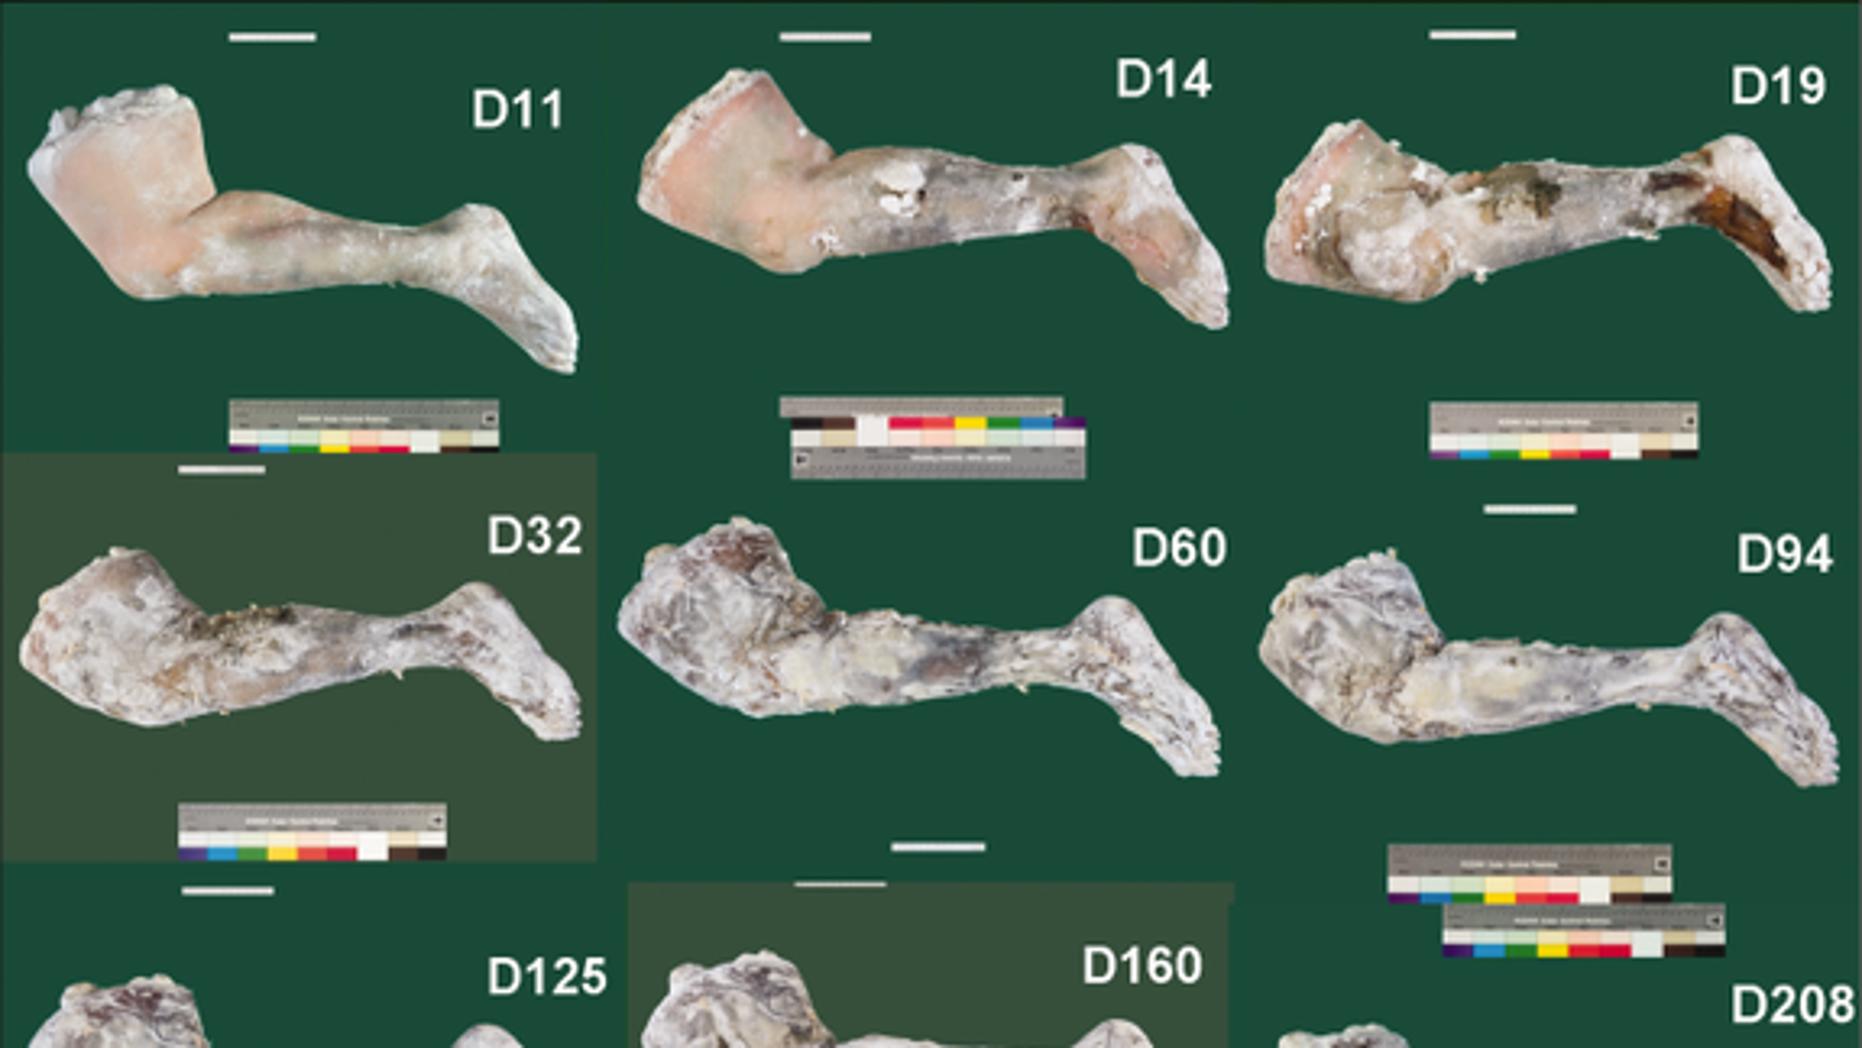 Mummified fresh human tissue